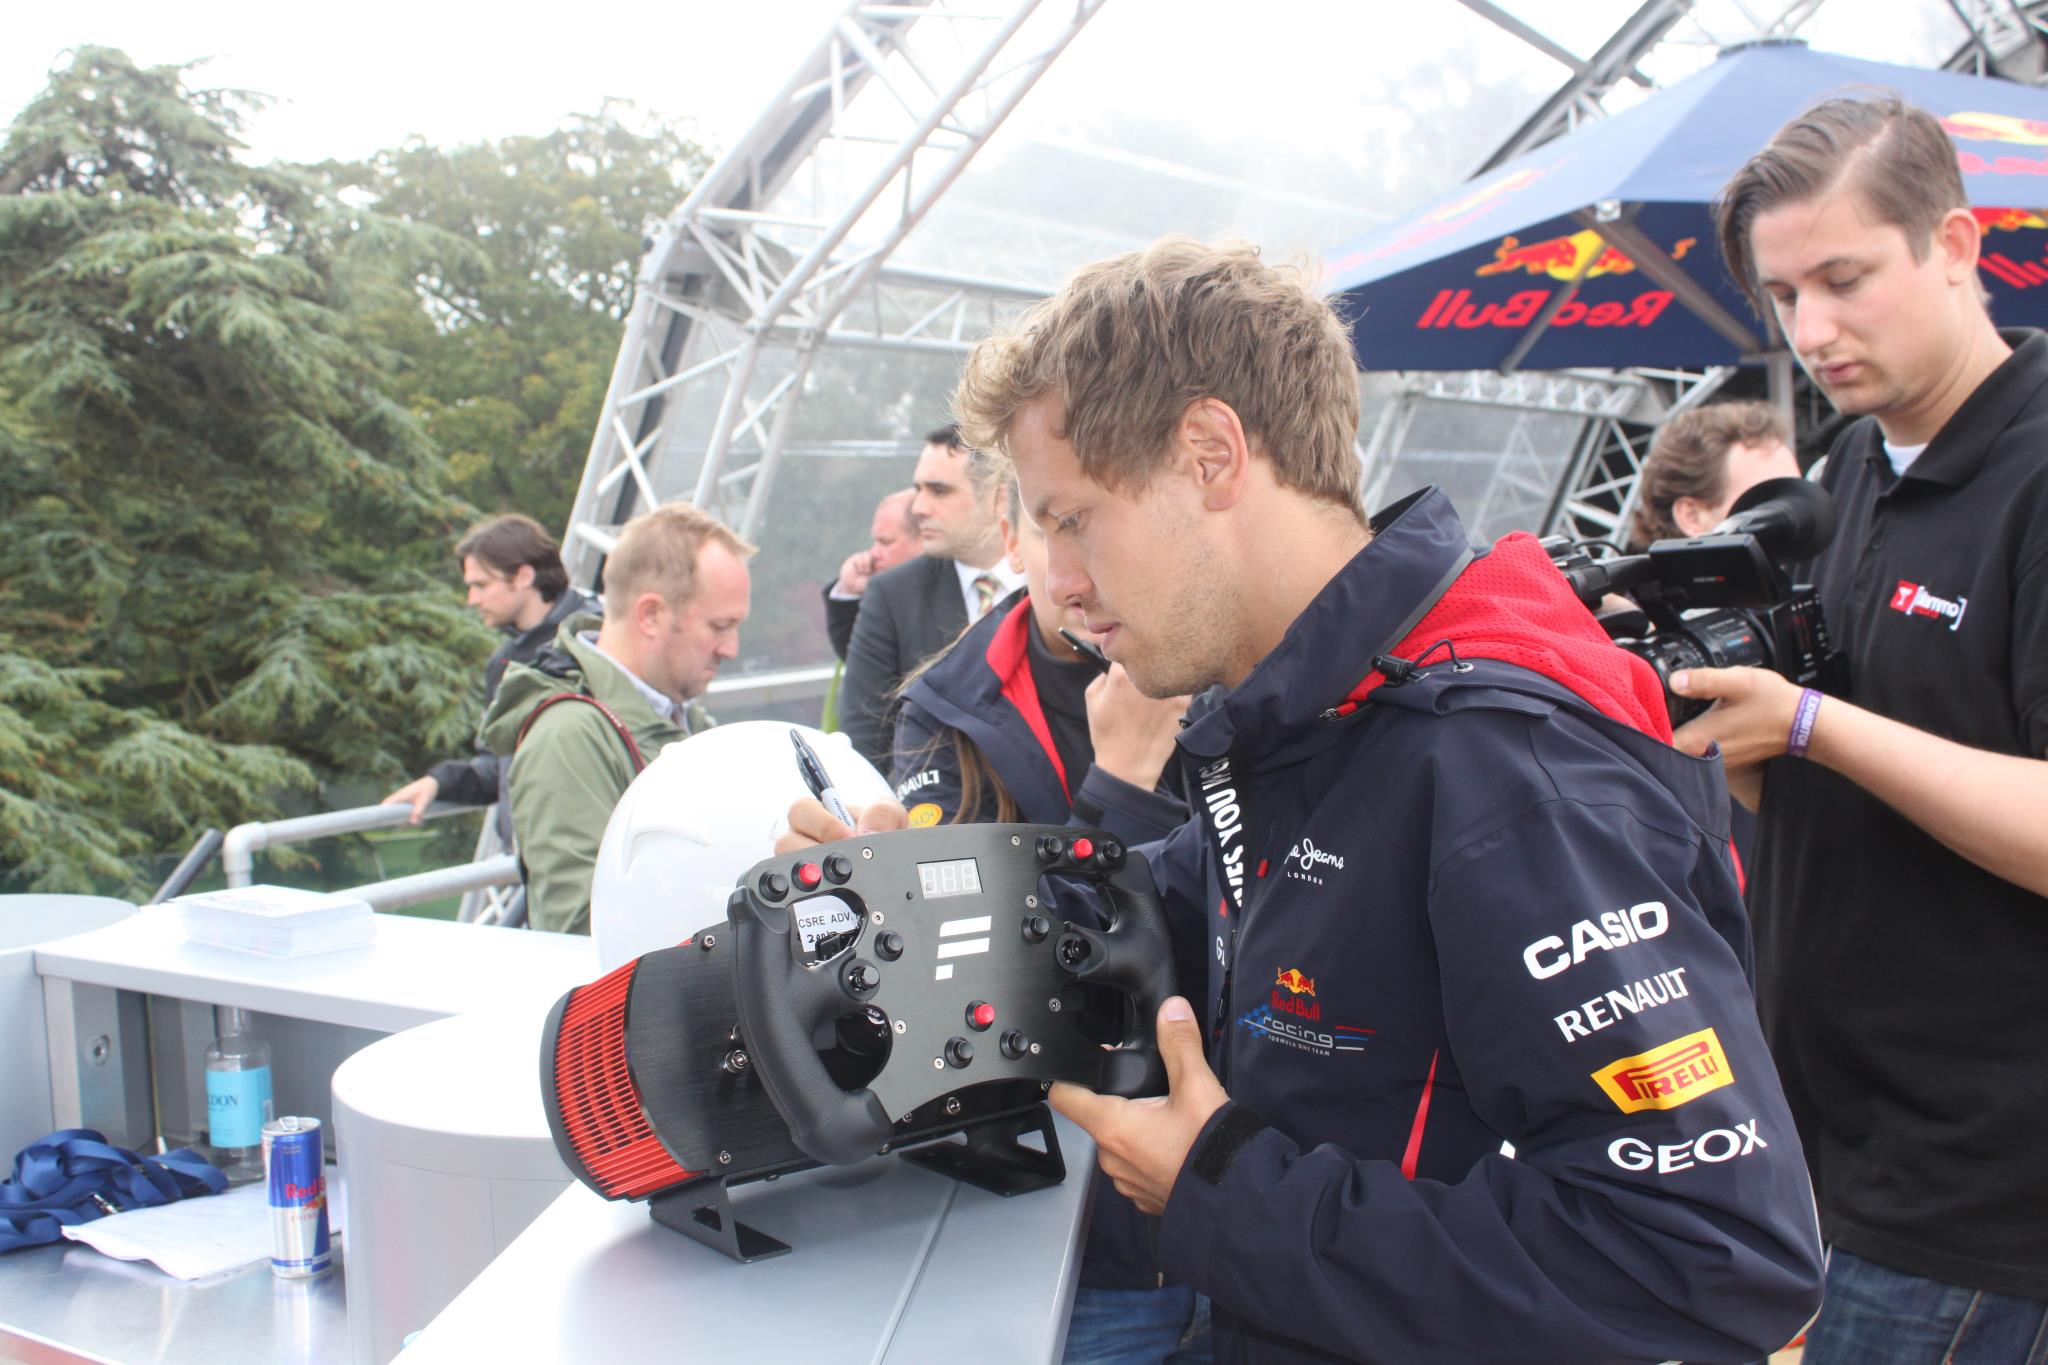 Fanatec auctions off a CSR Elite wheel signed by Sebastian Vettel